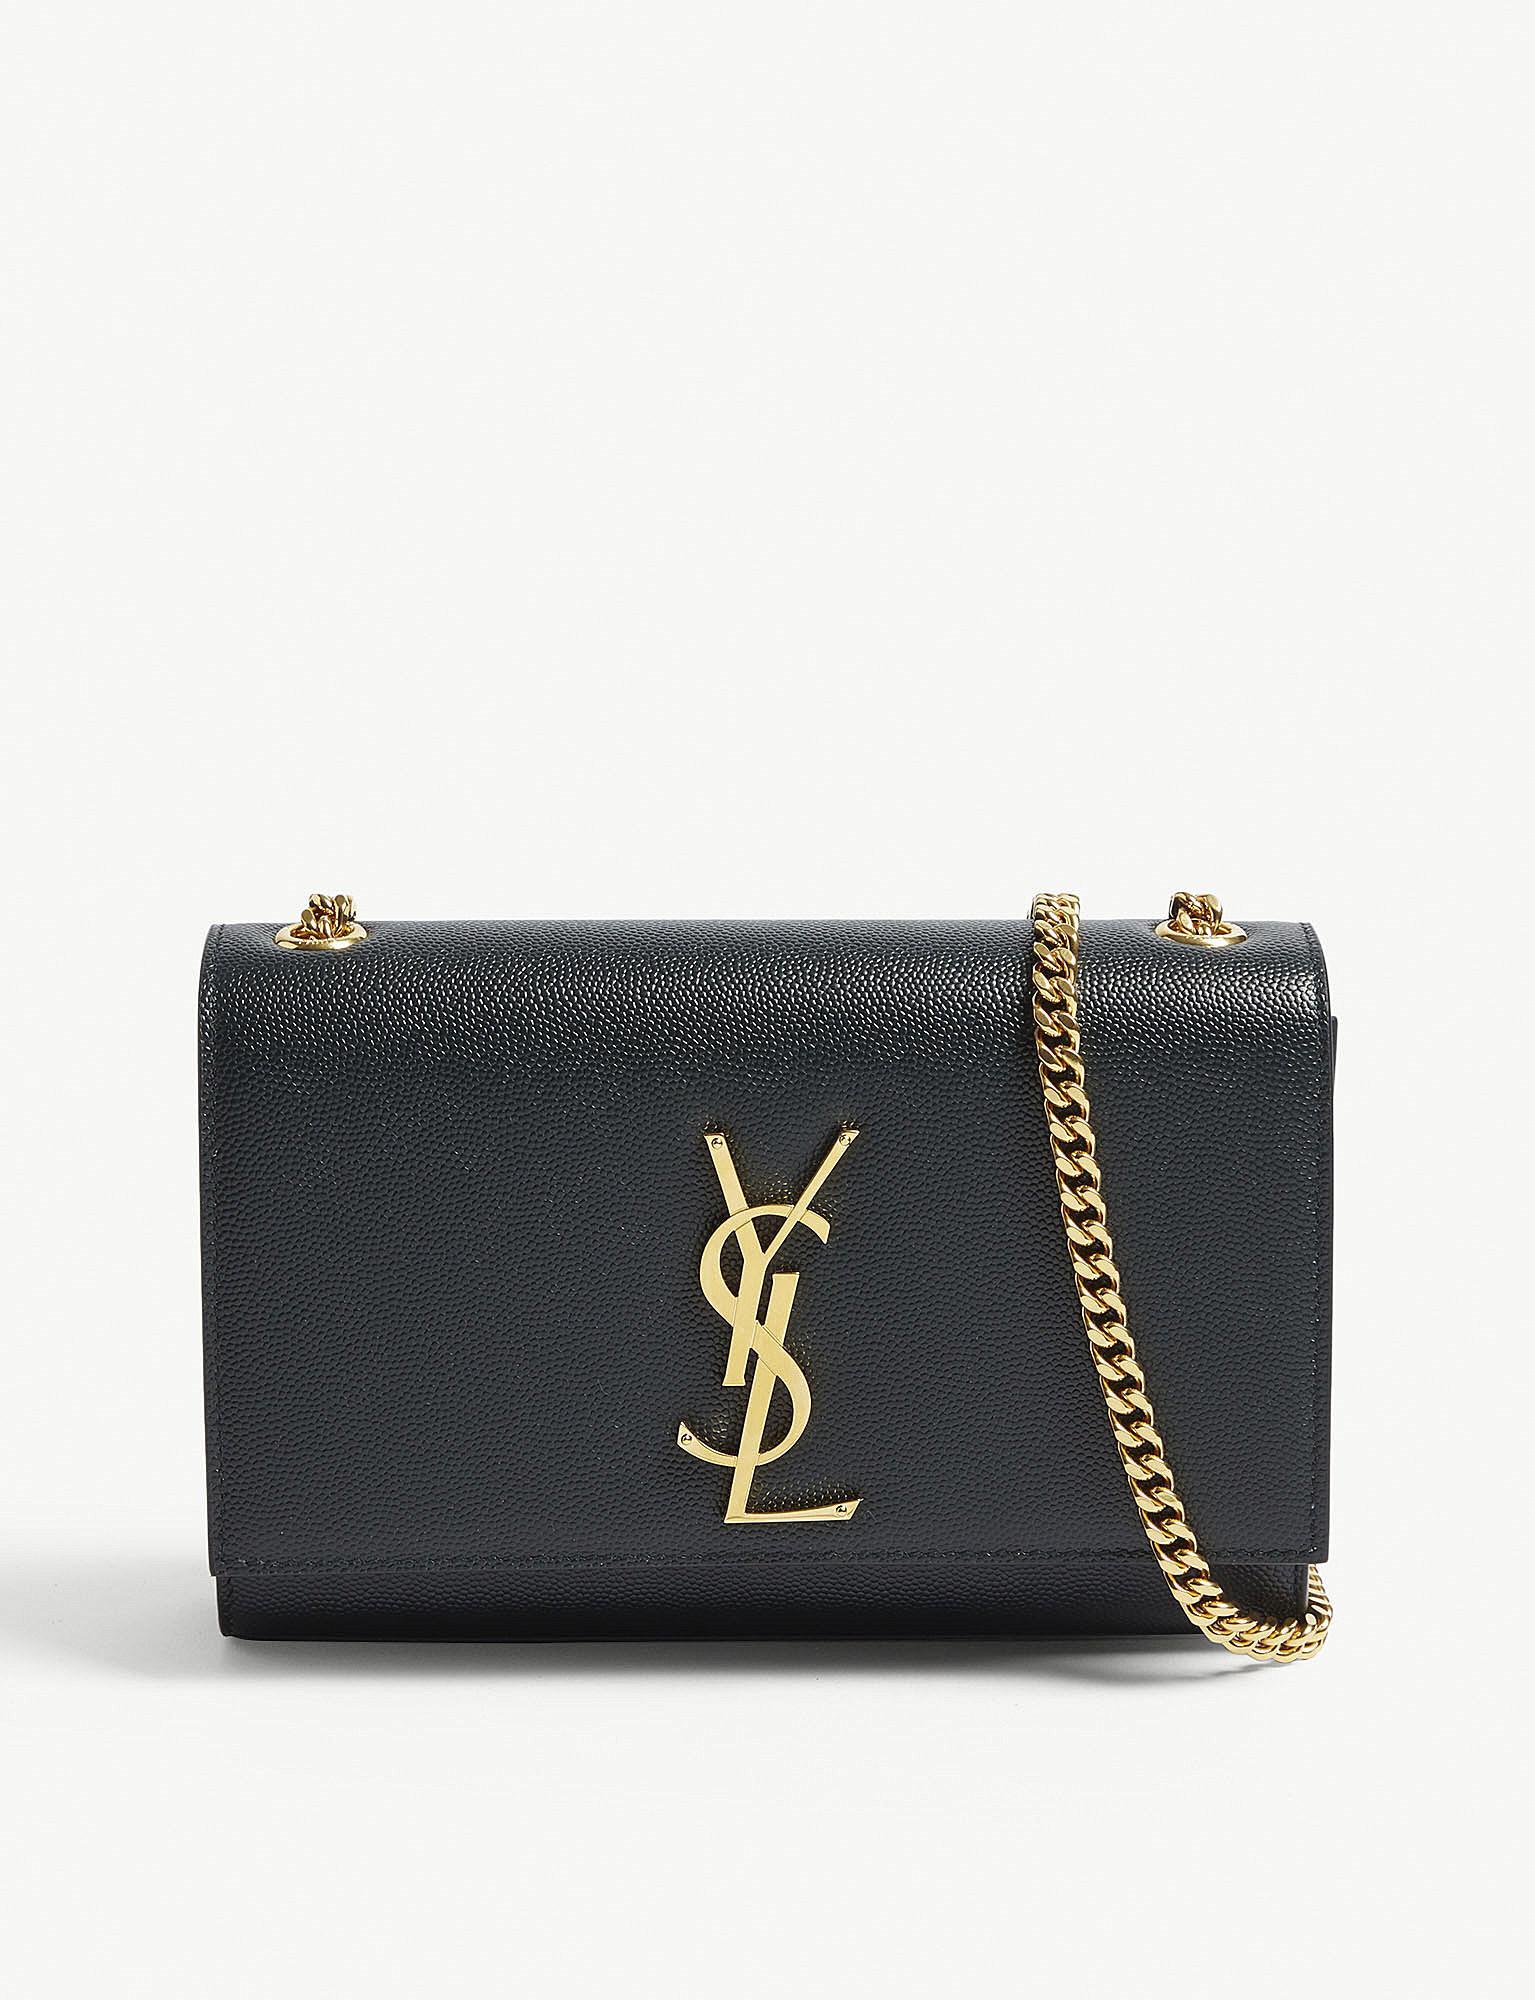 0674ecf5fbadd Saint Laurent. Women s Deep Green Kate Monogram Grained Leather Cross-body  Bag